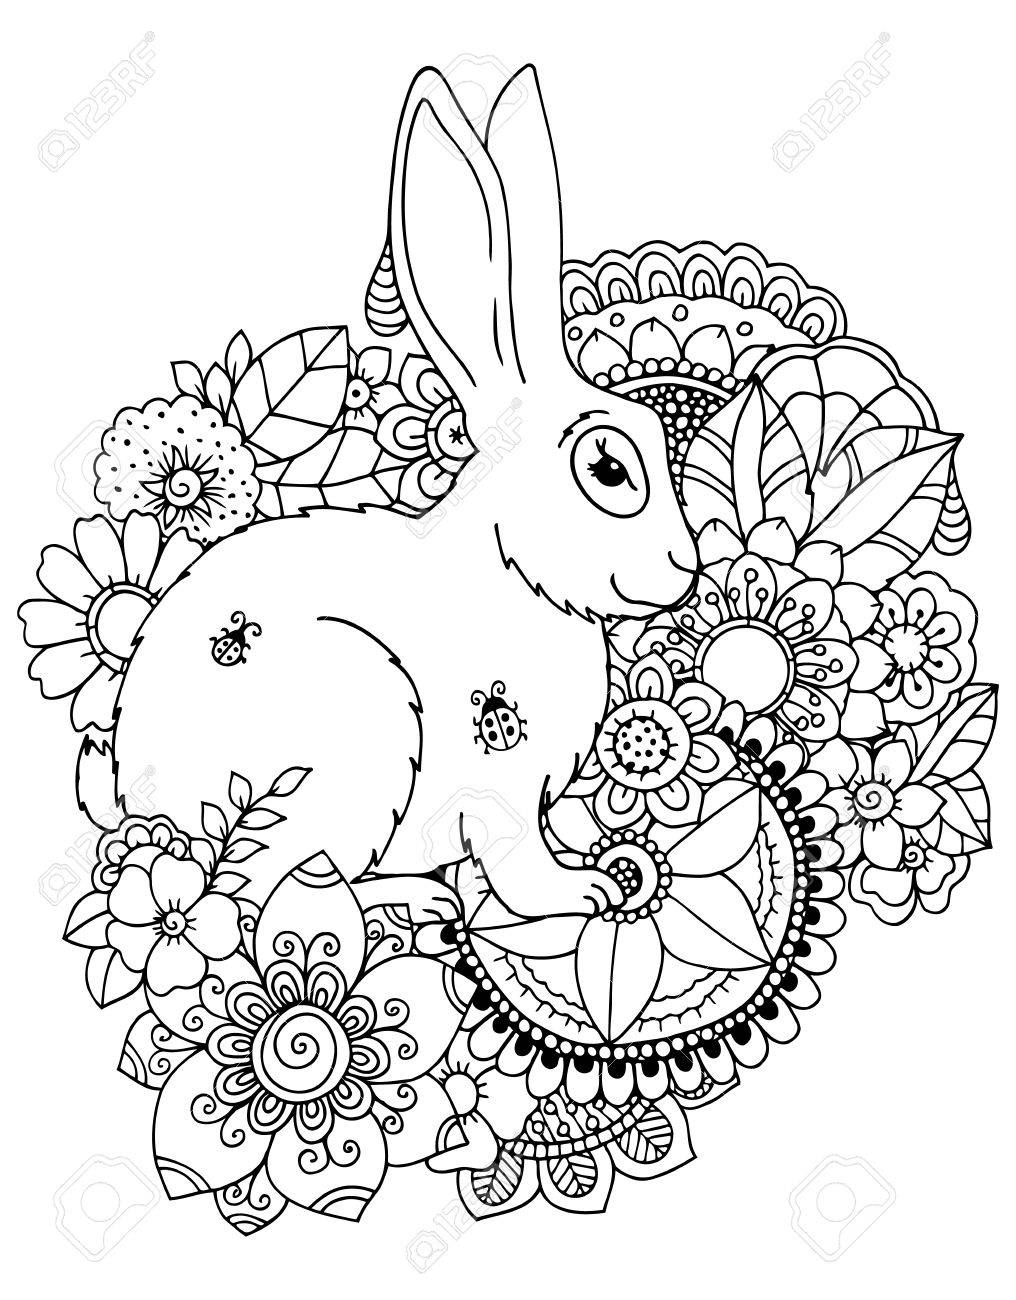 Vektor-Illustration Zentangl Hase In Blumen ...